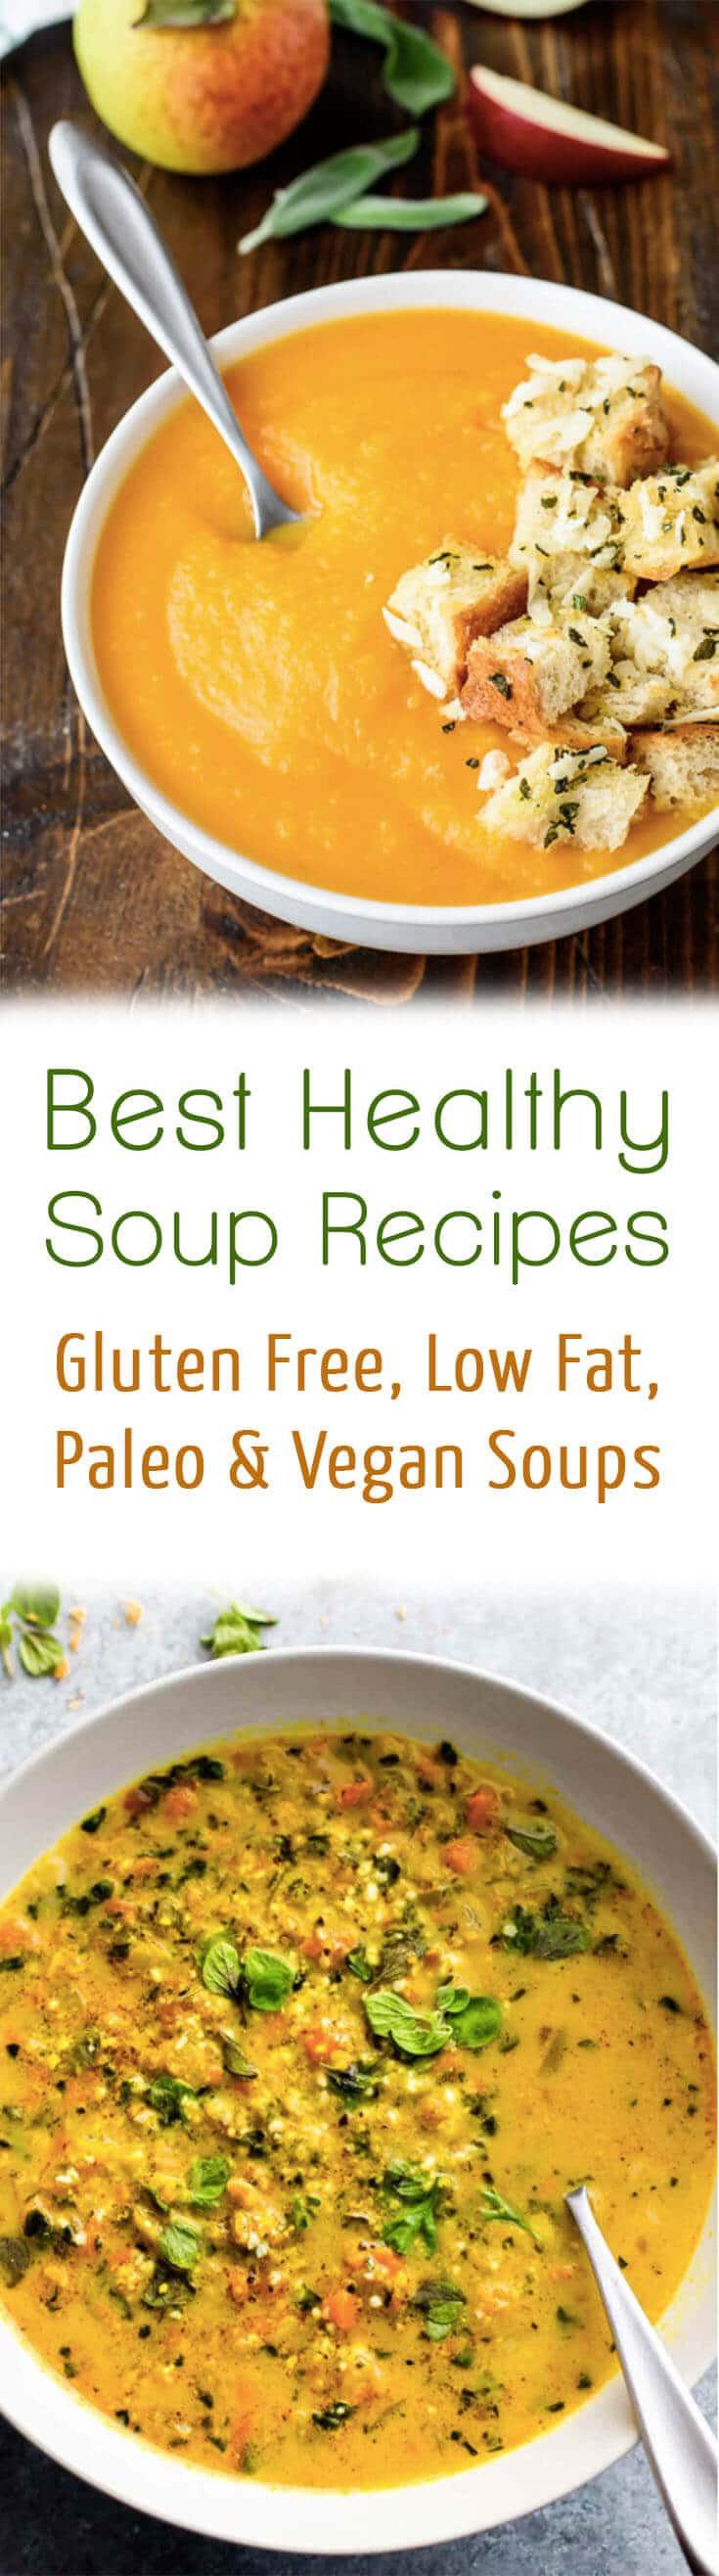 Healthy Low Calorie Soup Recipes  10 Best Healthy Soup Recipes